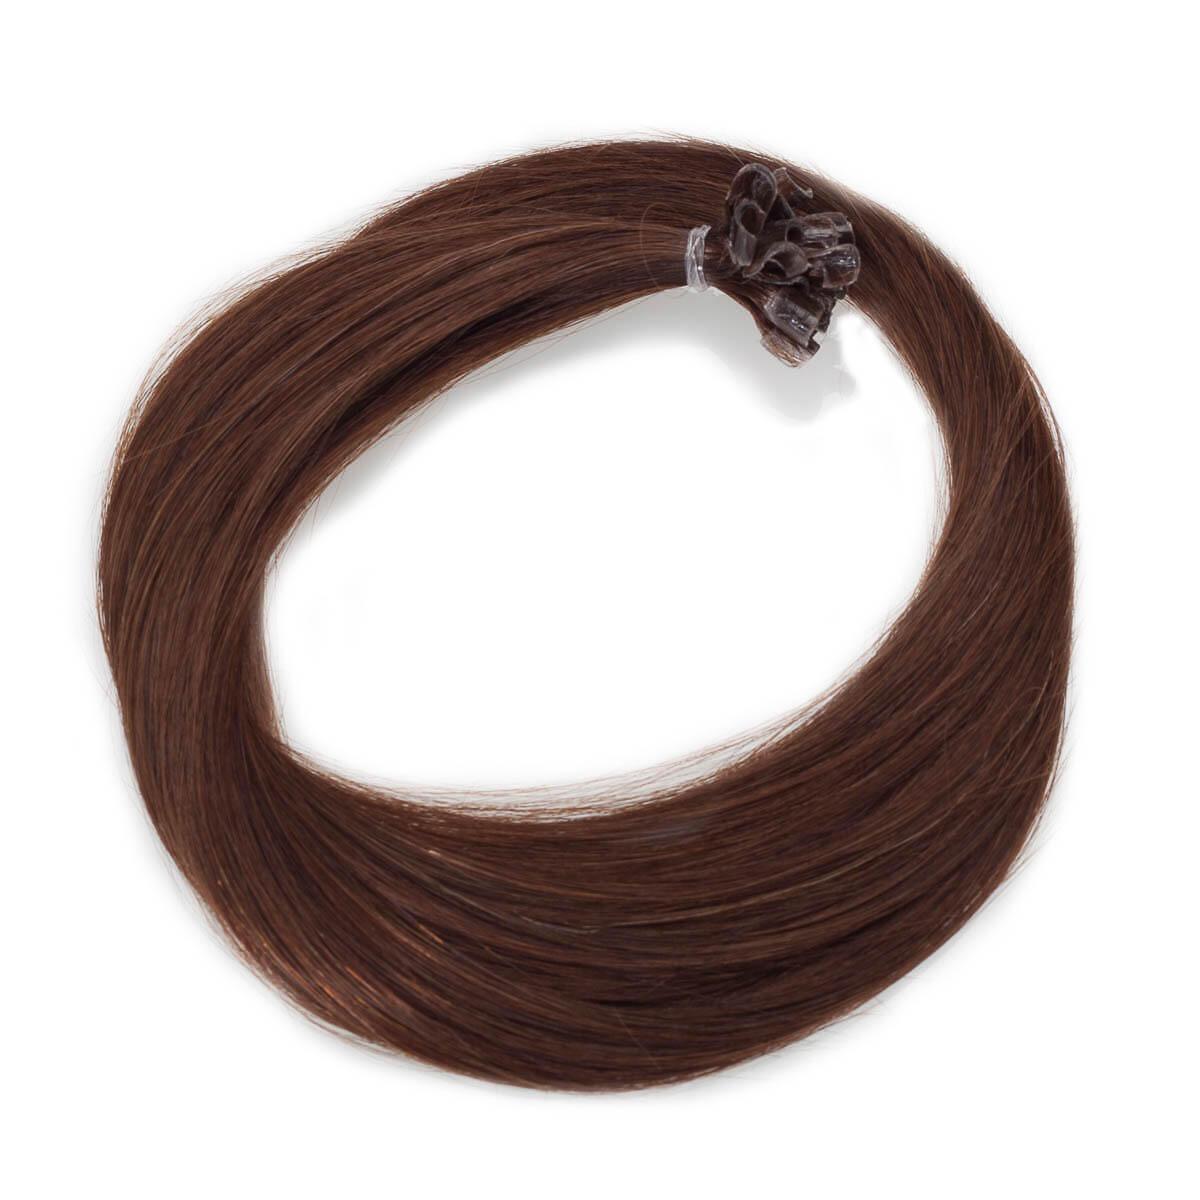 Nail Hair Original 2.0 Dark Brown 60 cm